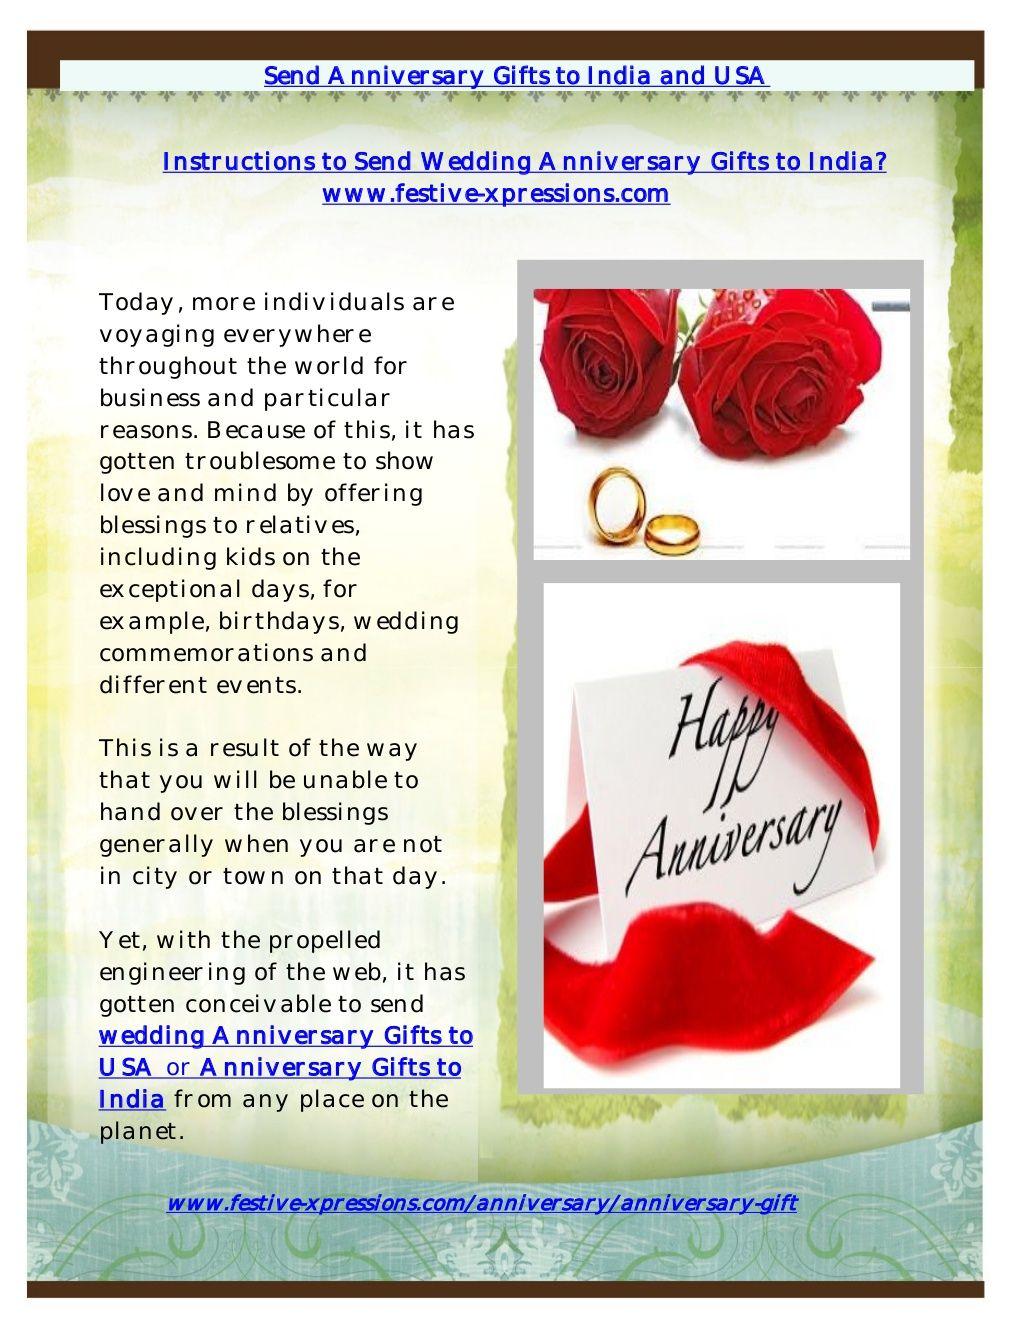 Send Wedding Anniversary Gifts To India By Pooja Sharma Via